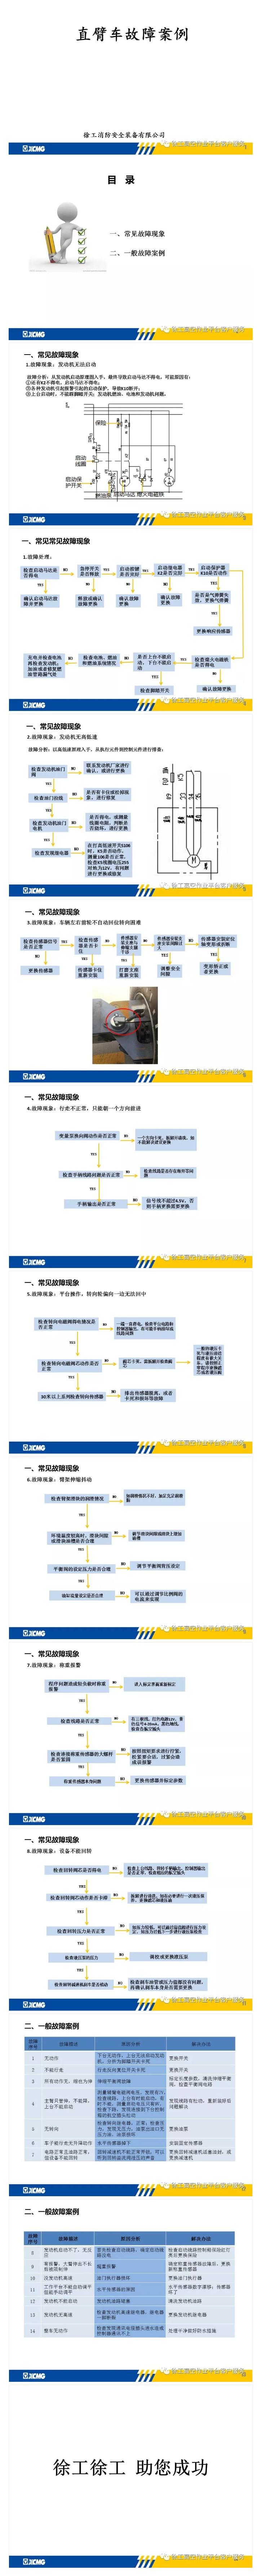 FireShot Capture 009 - 徐工高空作业平台直臂车故障案例 - mp.weixin.qq.com.jpg